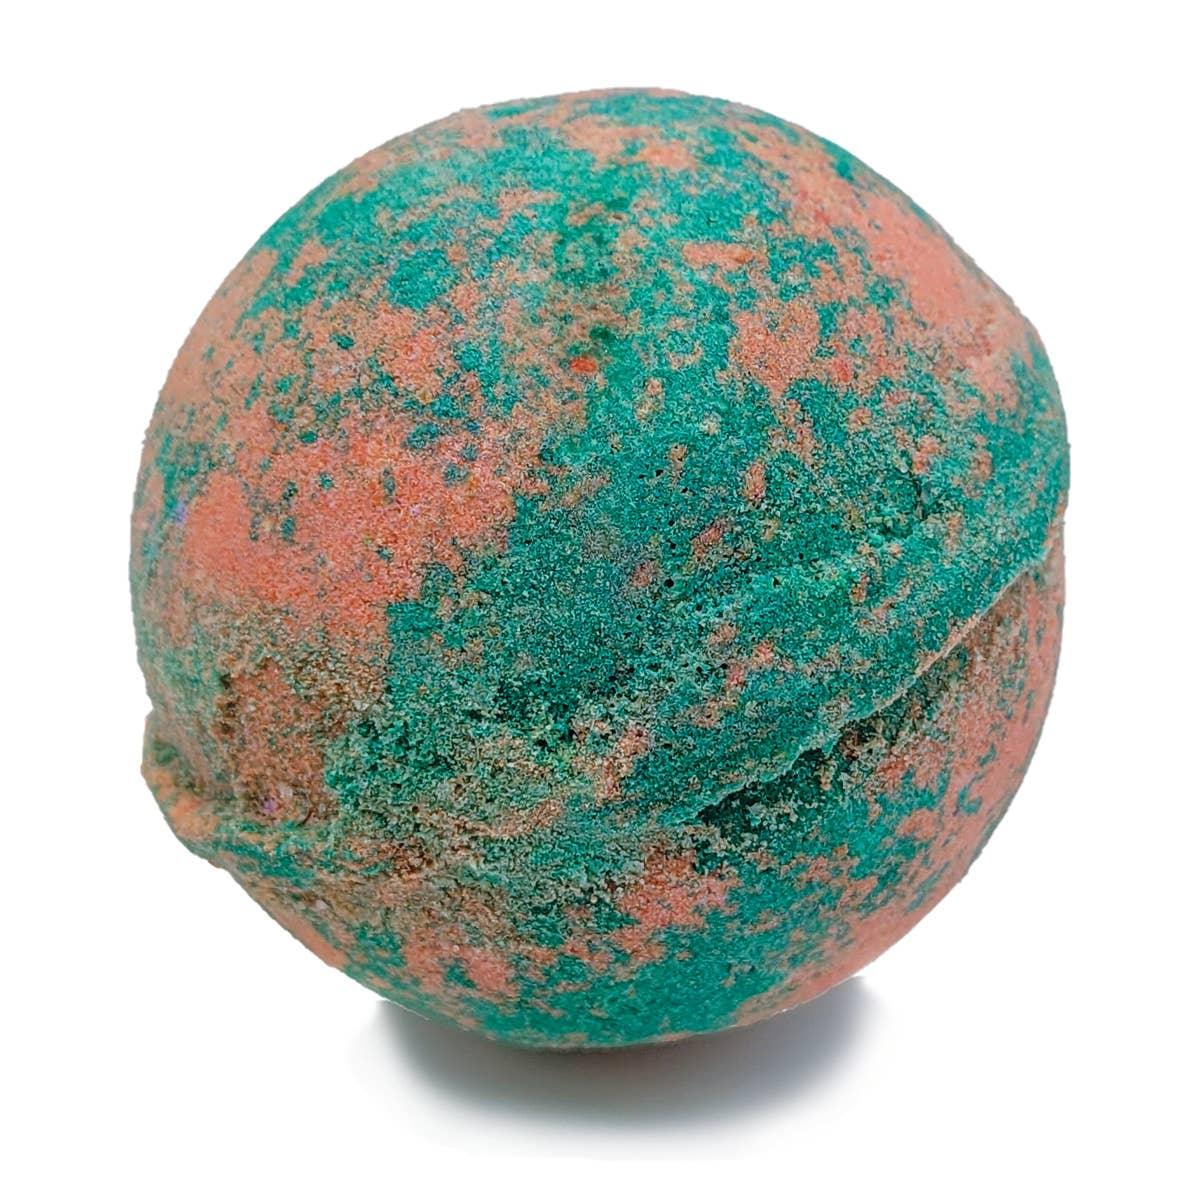 Evolve - Bath Bomb - Cucumber Melon | Trada Marketplace